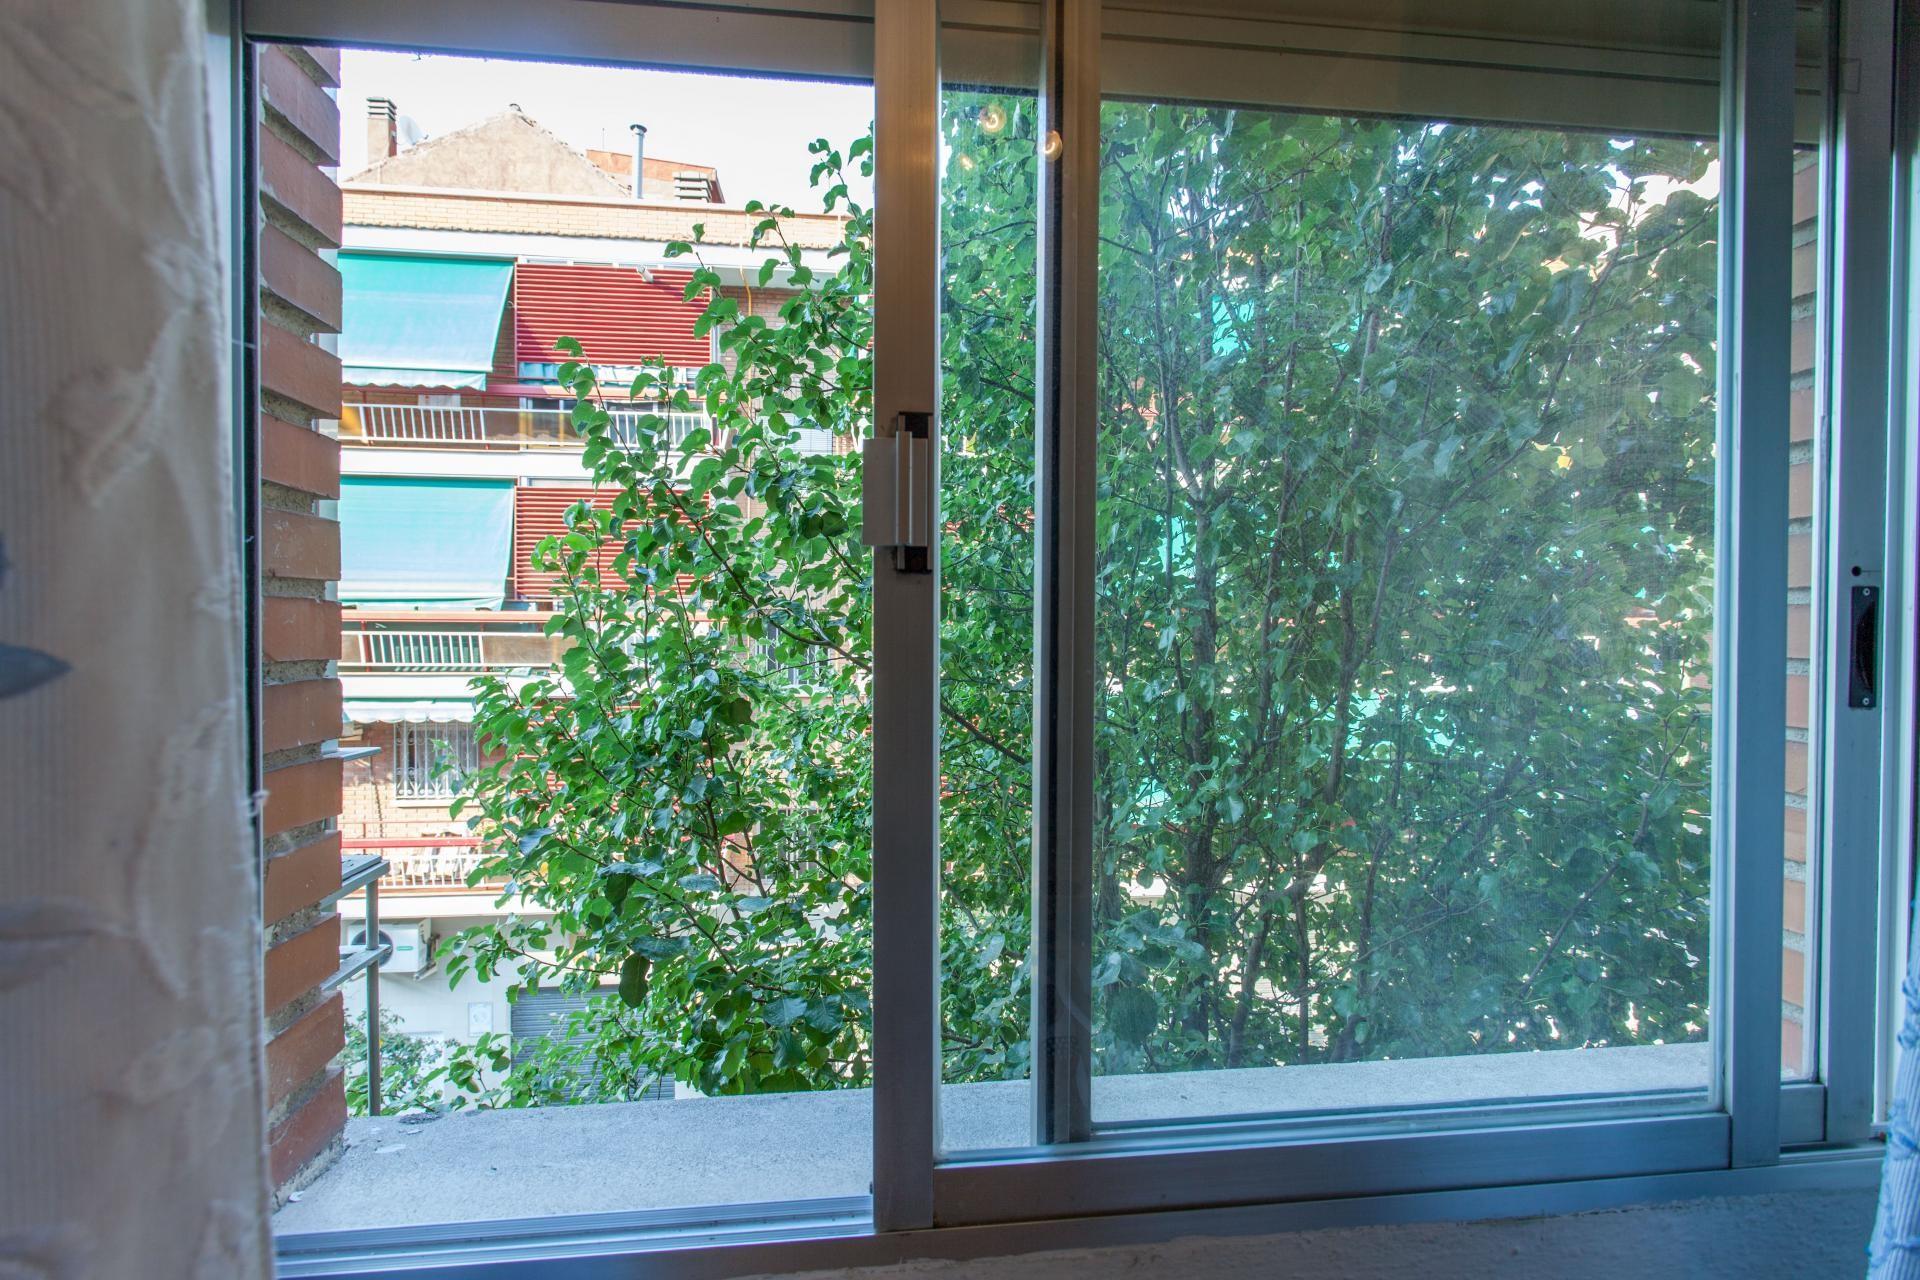 Piso amplio y luminoso de 3 habitaciones alquiler pisos for Pisos xativa 9 d octubre xativa